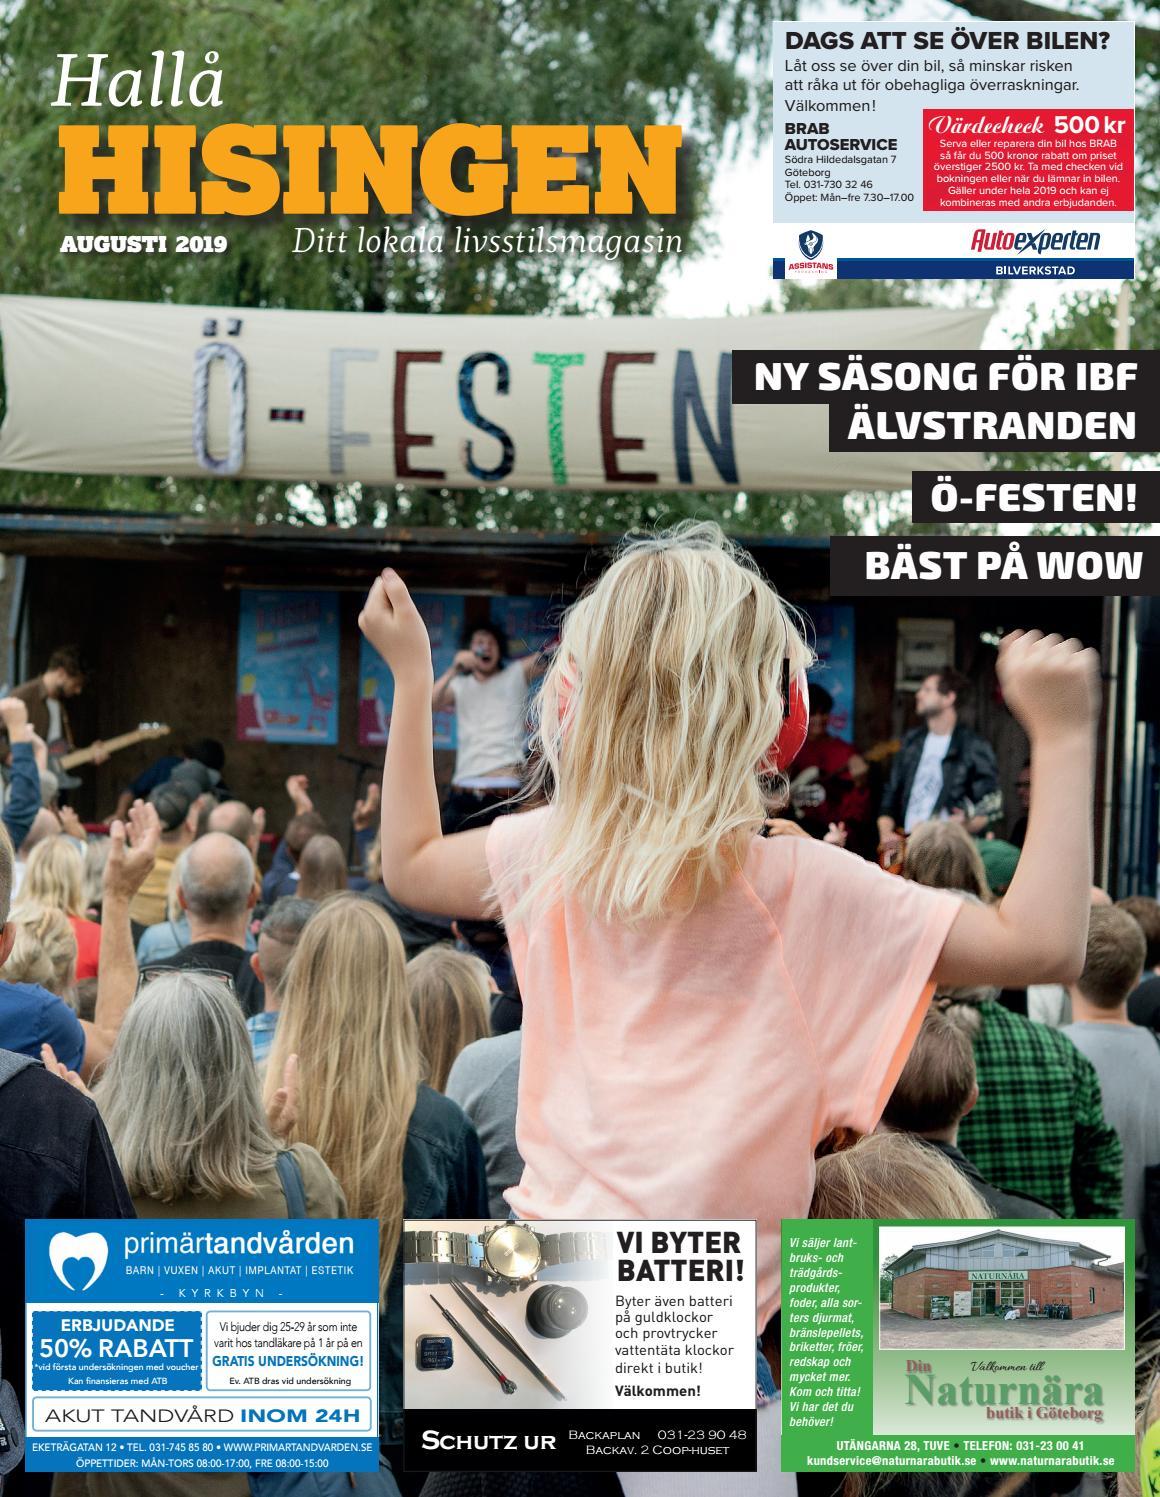 Tjej Flirt Norway Farsund - kontaktannonser kvinna sker man